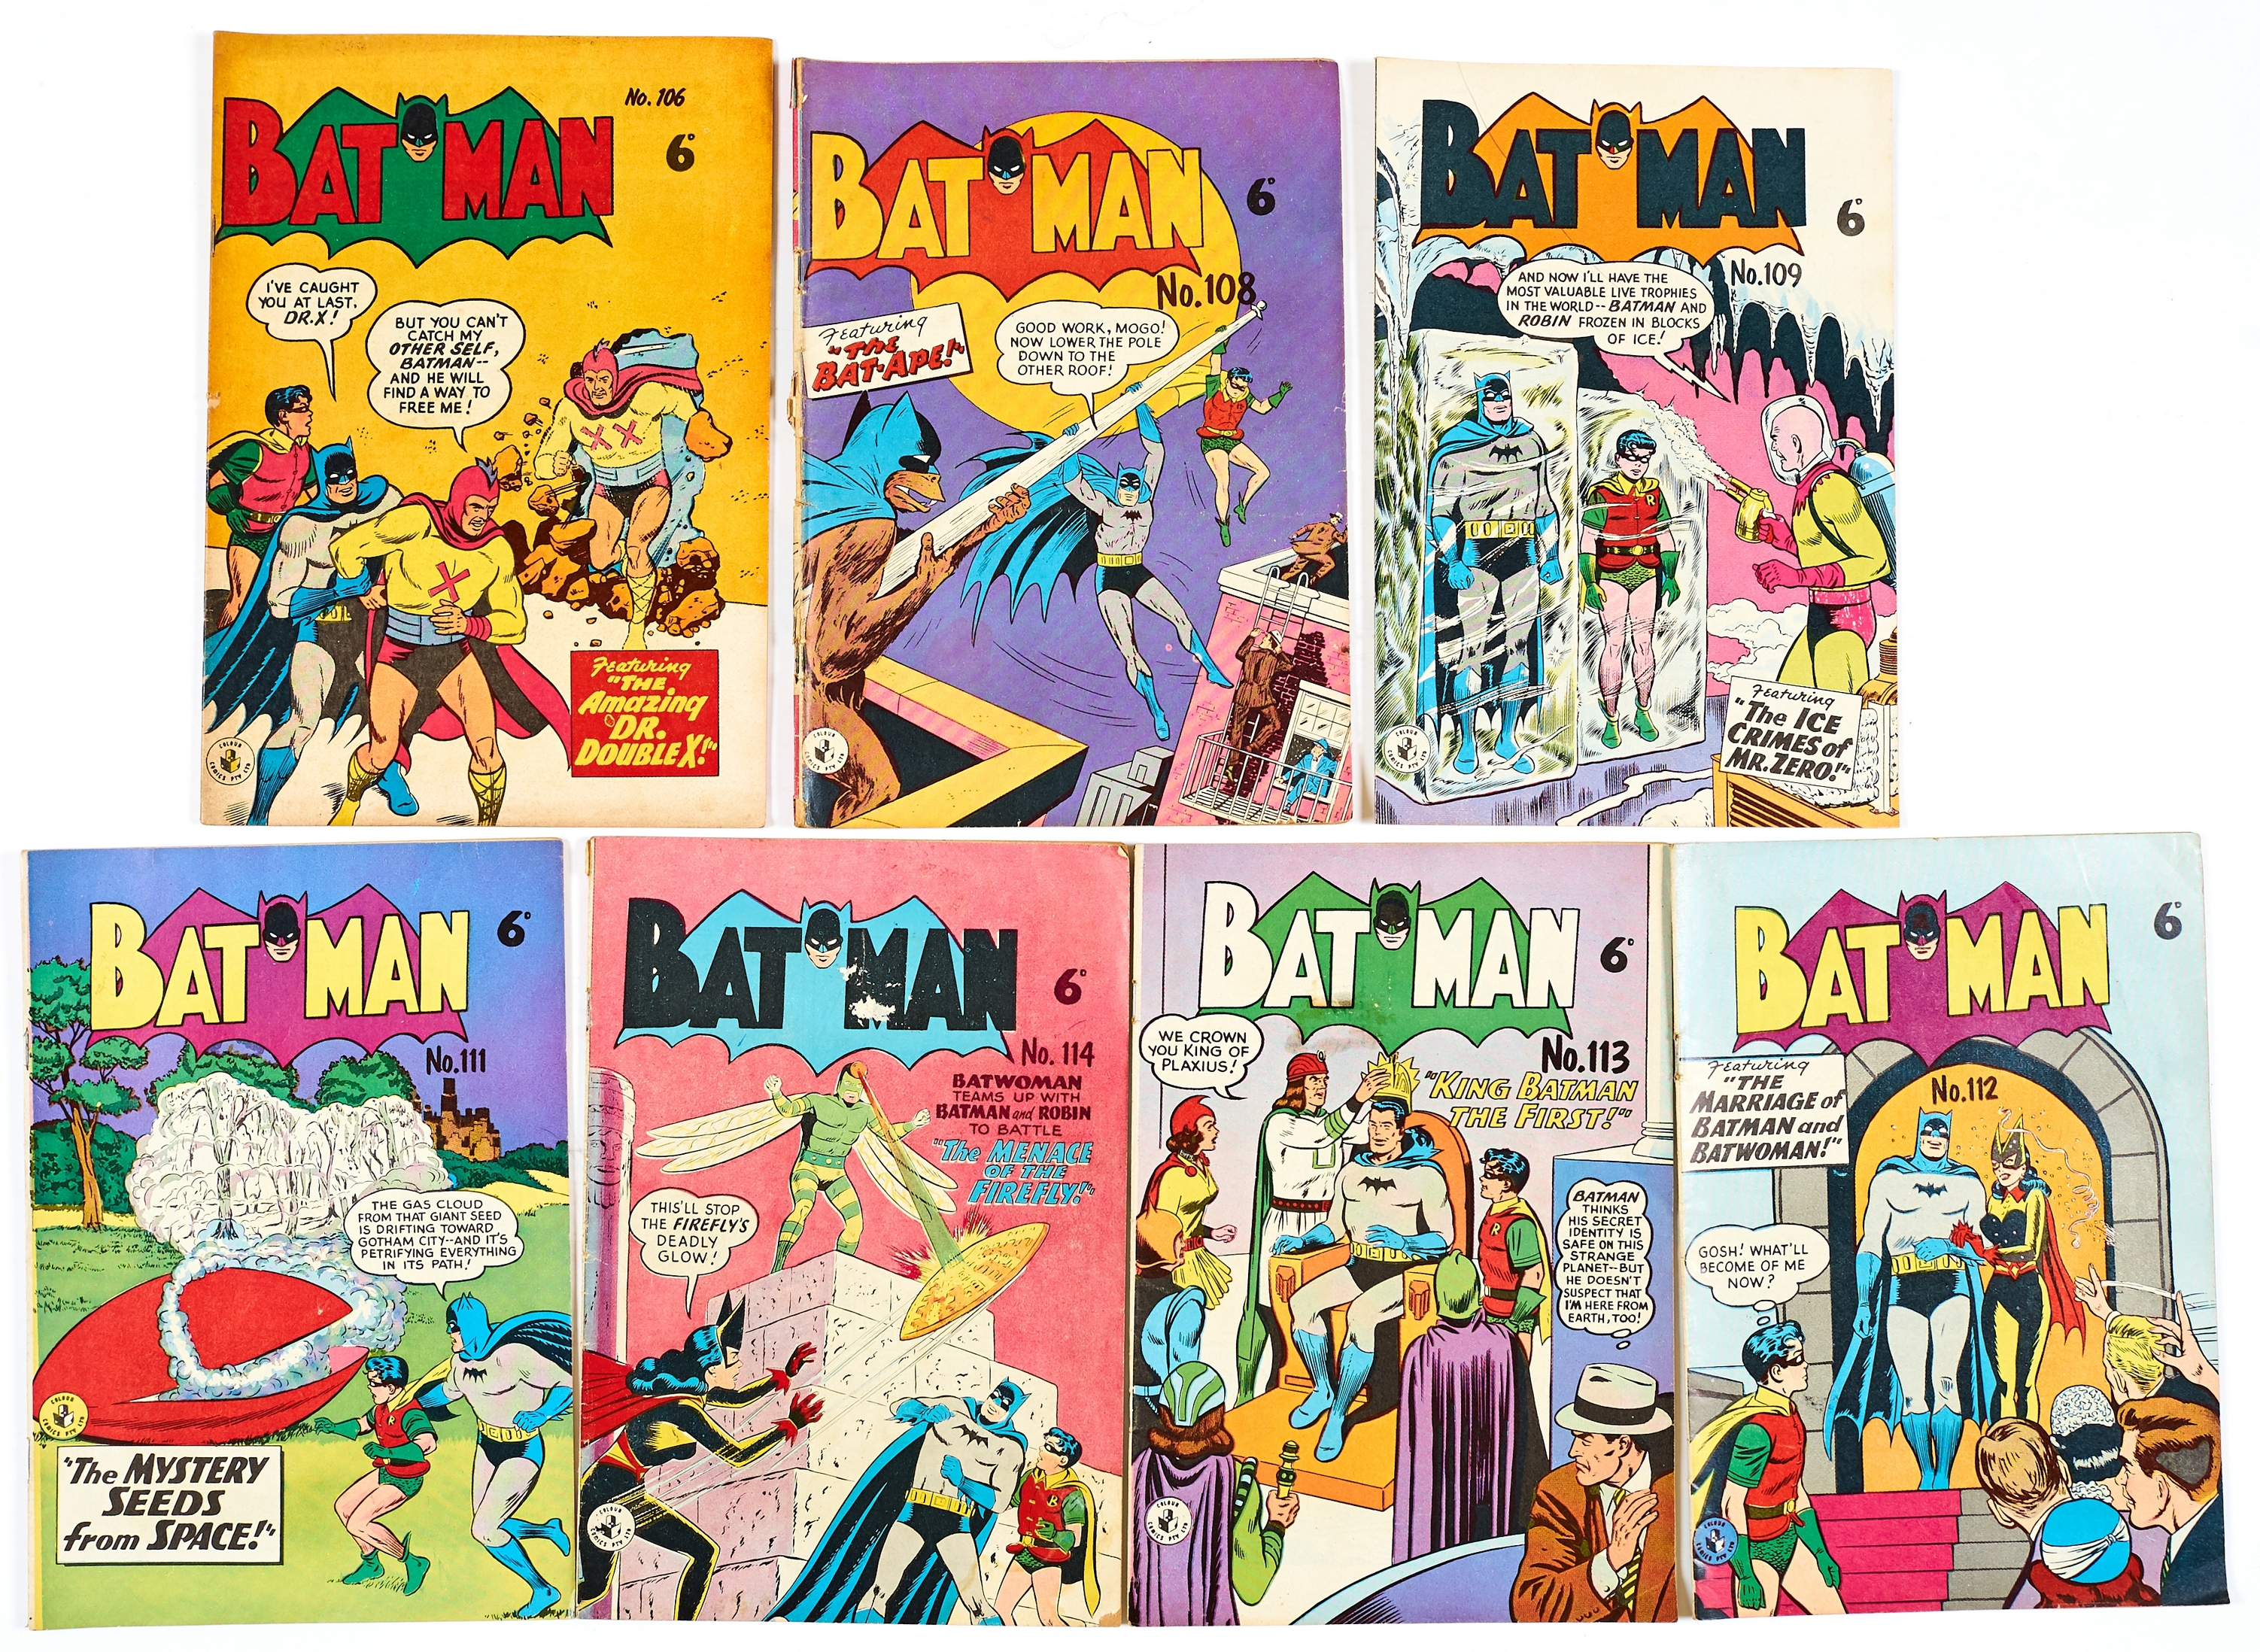 Lot 37 - Batman Australian reprints (1950s) 106, 108, 109, 111-114. No 108 [gd], balance [vg/fn-] (7)